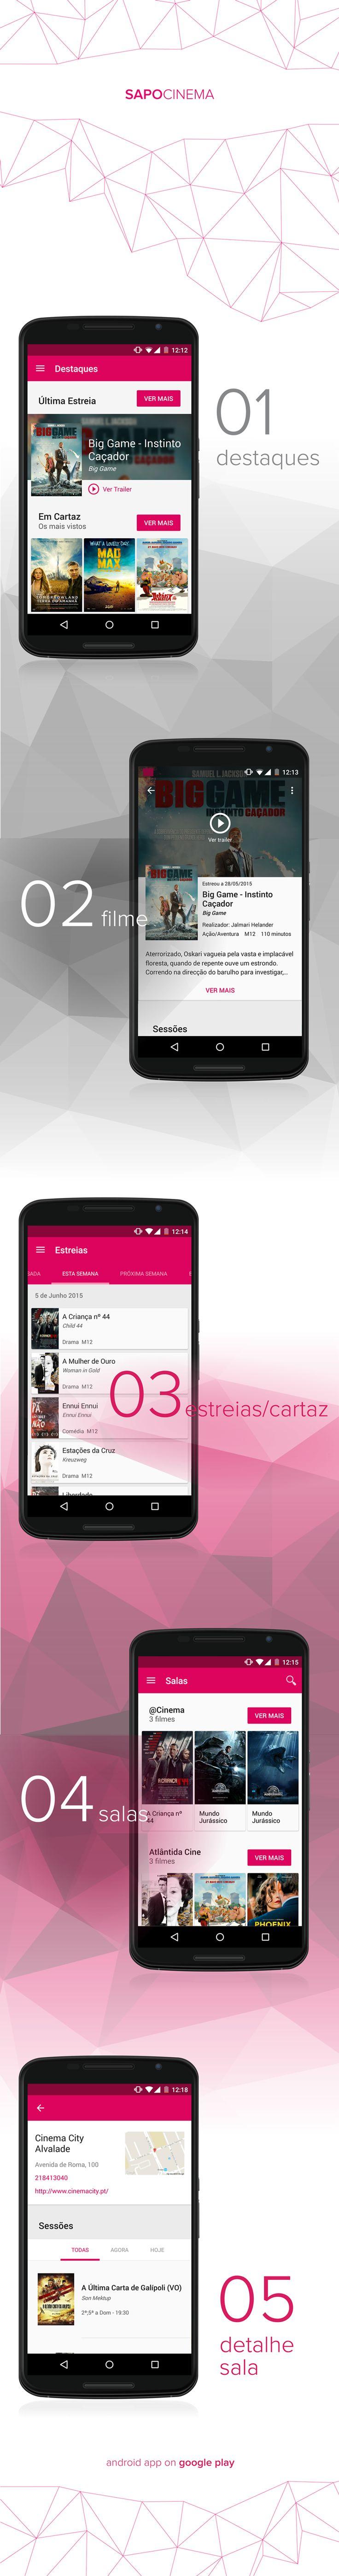 sapo cinema app - android